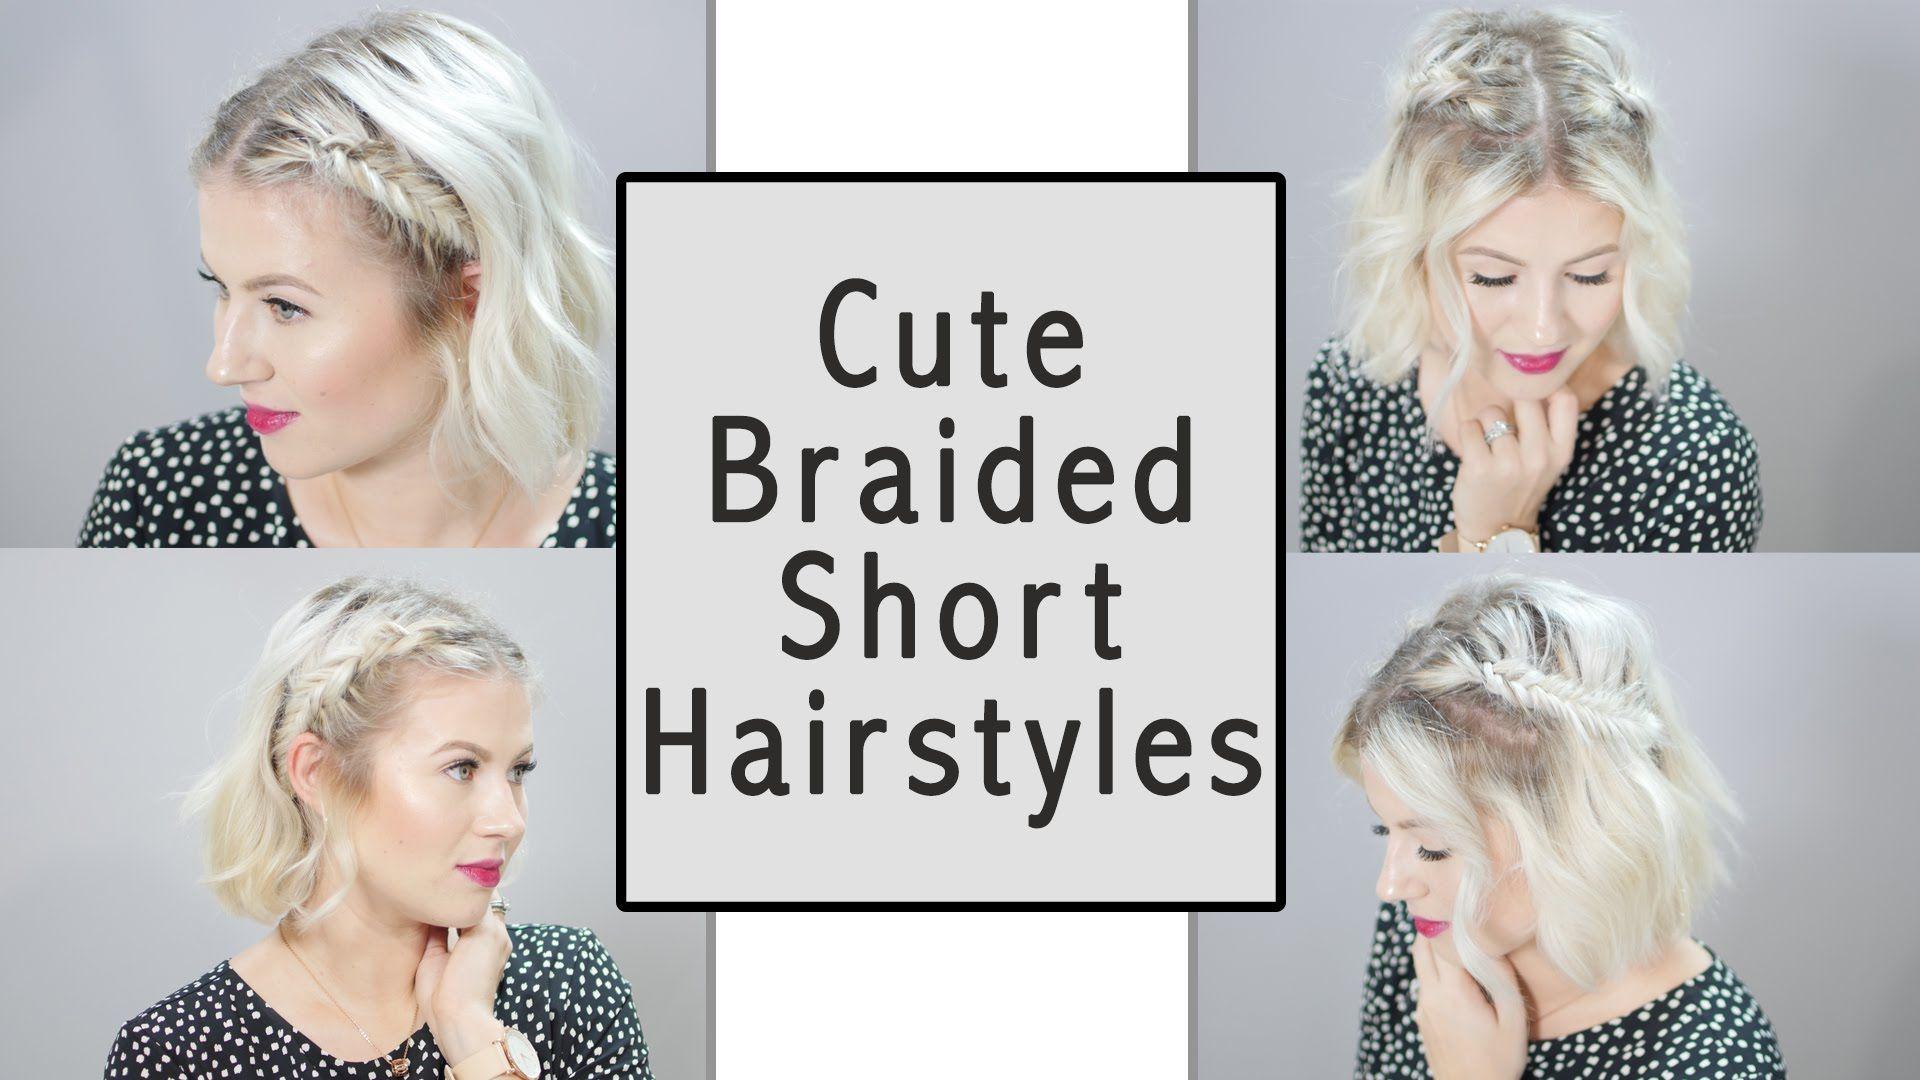 CUTE BRAIDED SHORT HAIRSTYLES | Milabu | All things hair | Pinterest ...